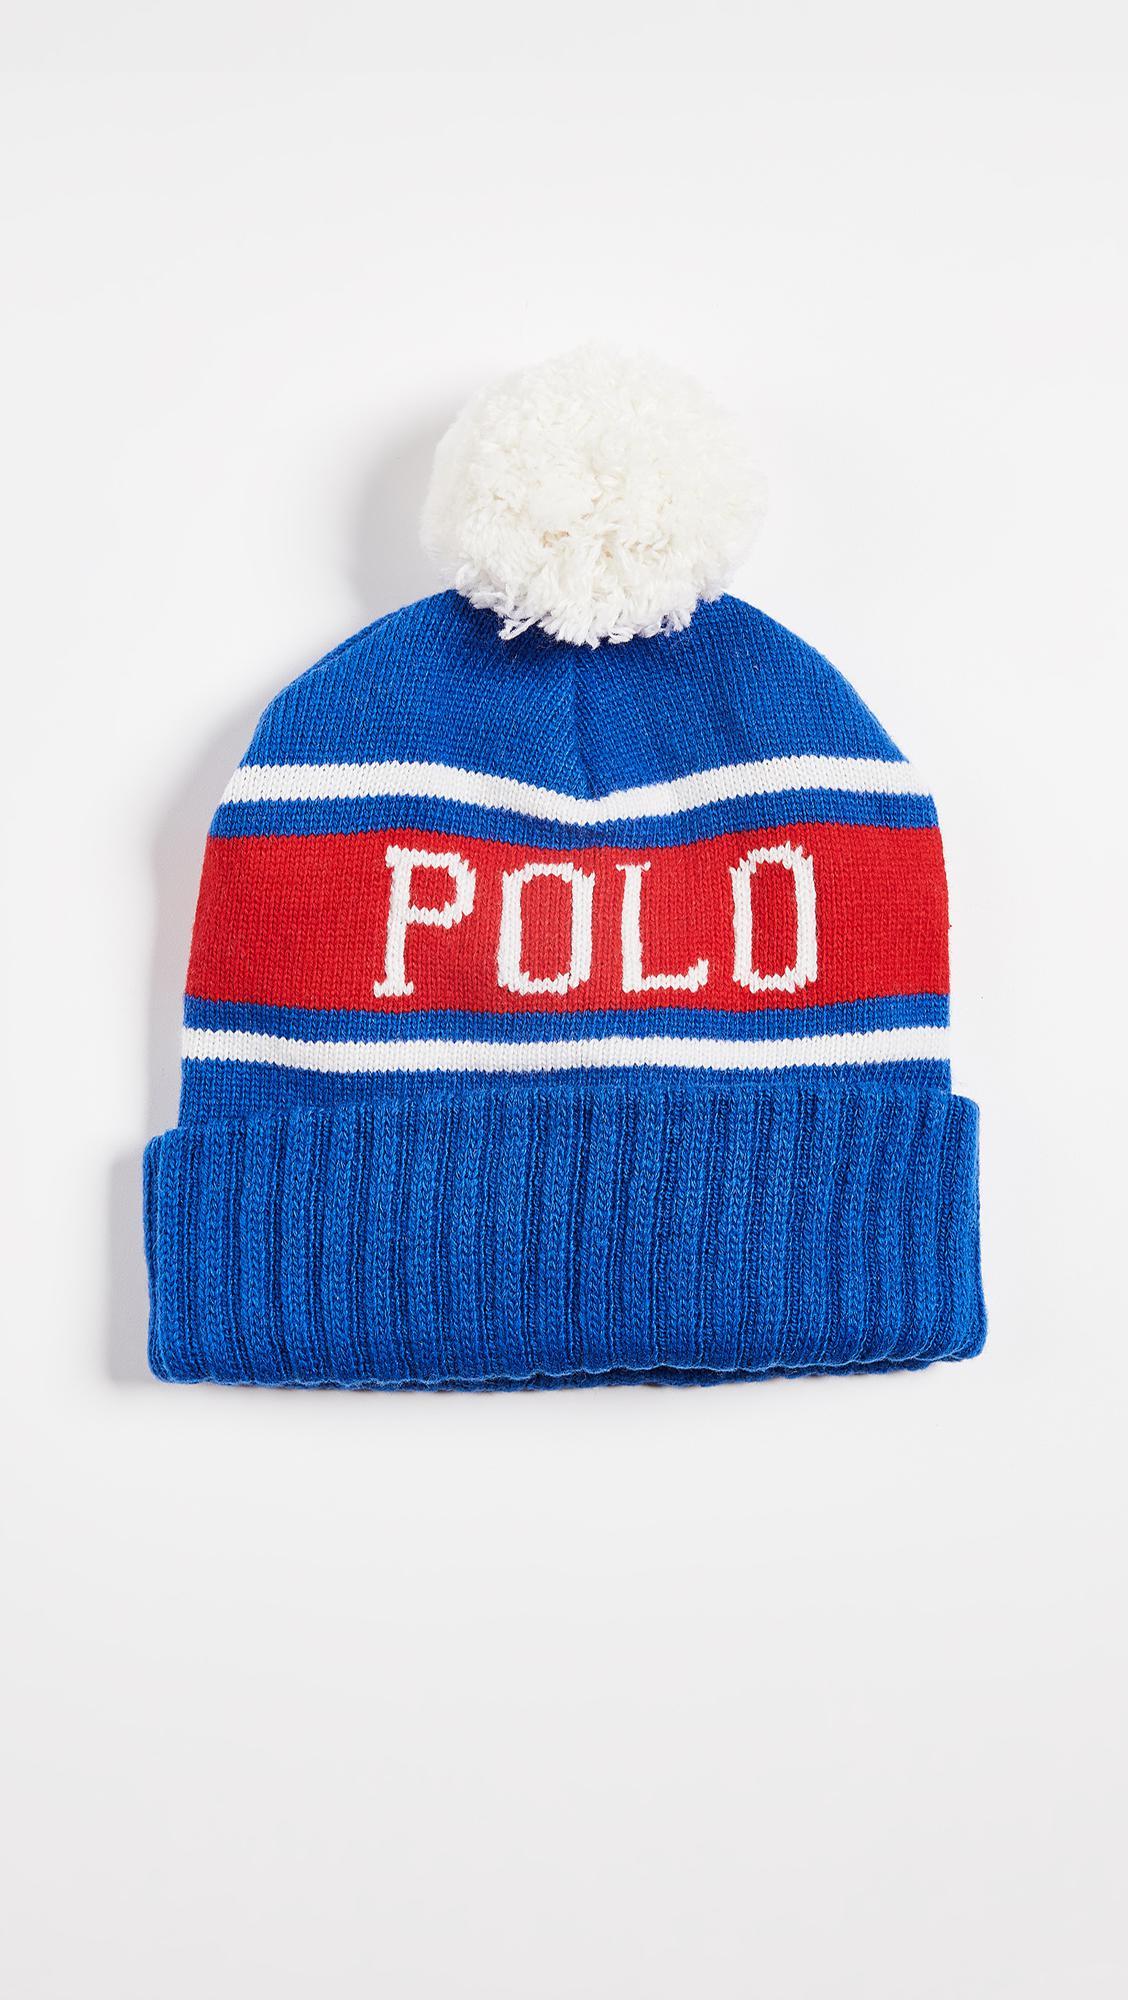 78f89fe56c9b7 Polo Ralph Lauren Wool Rope Beanie - Parchment N Lead